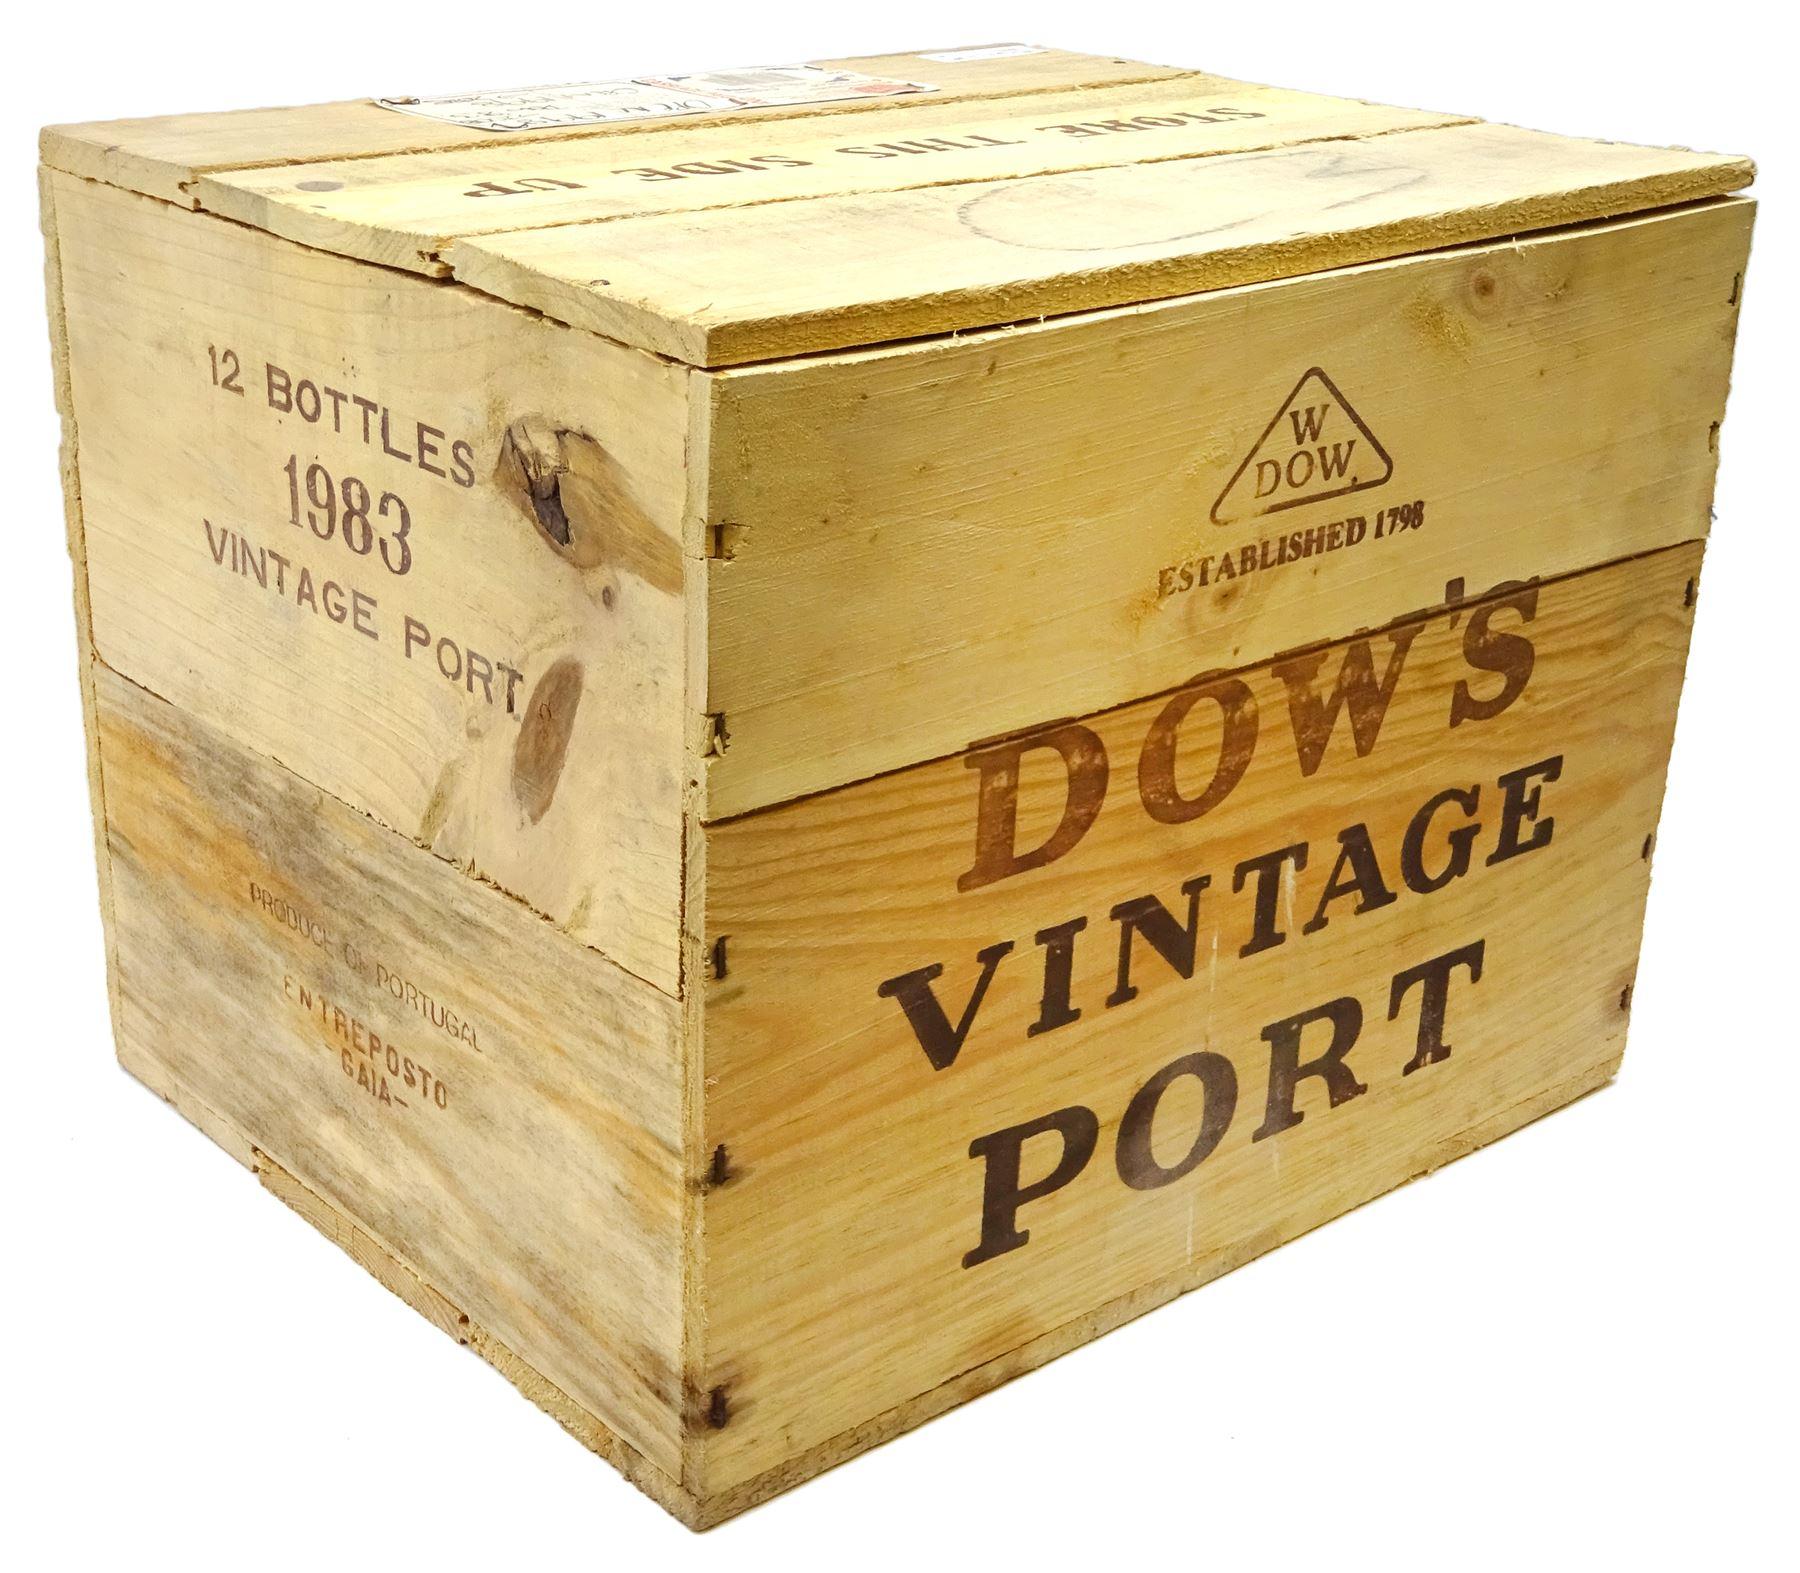 Dow's 1983 vintage port